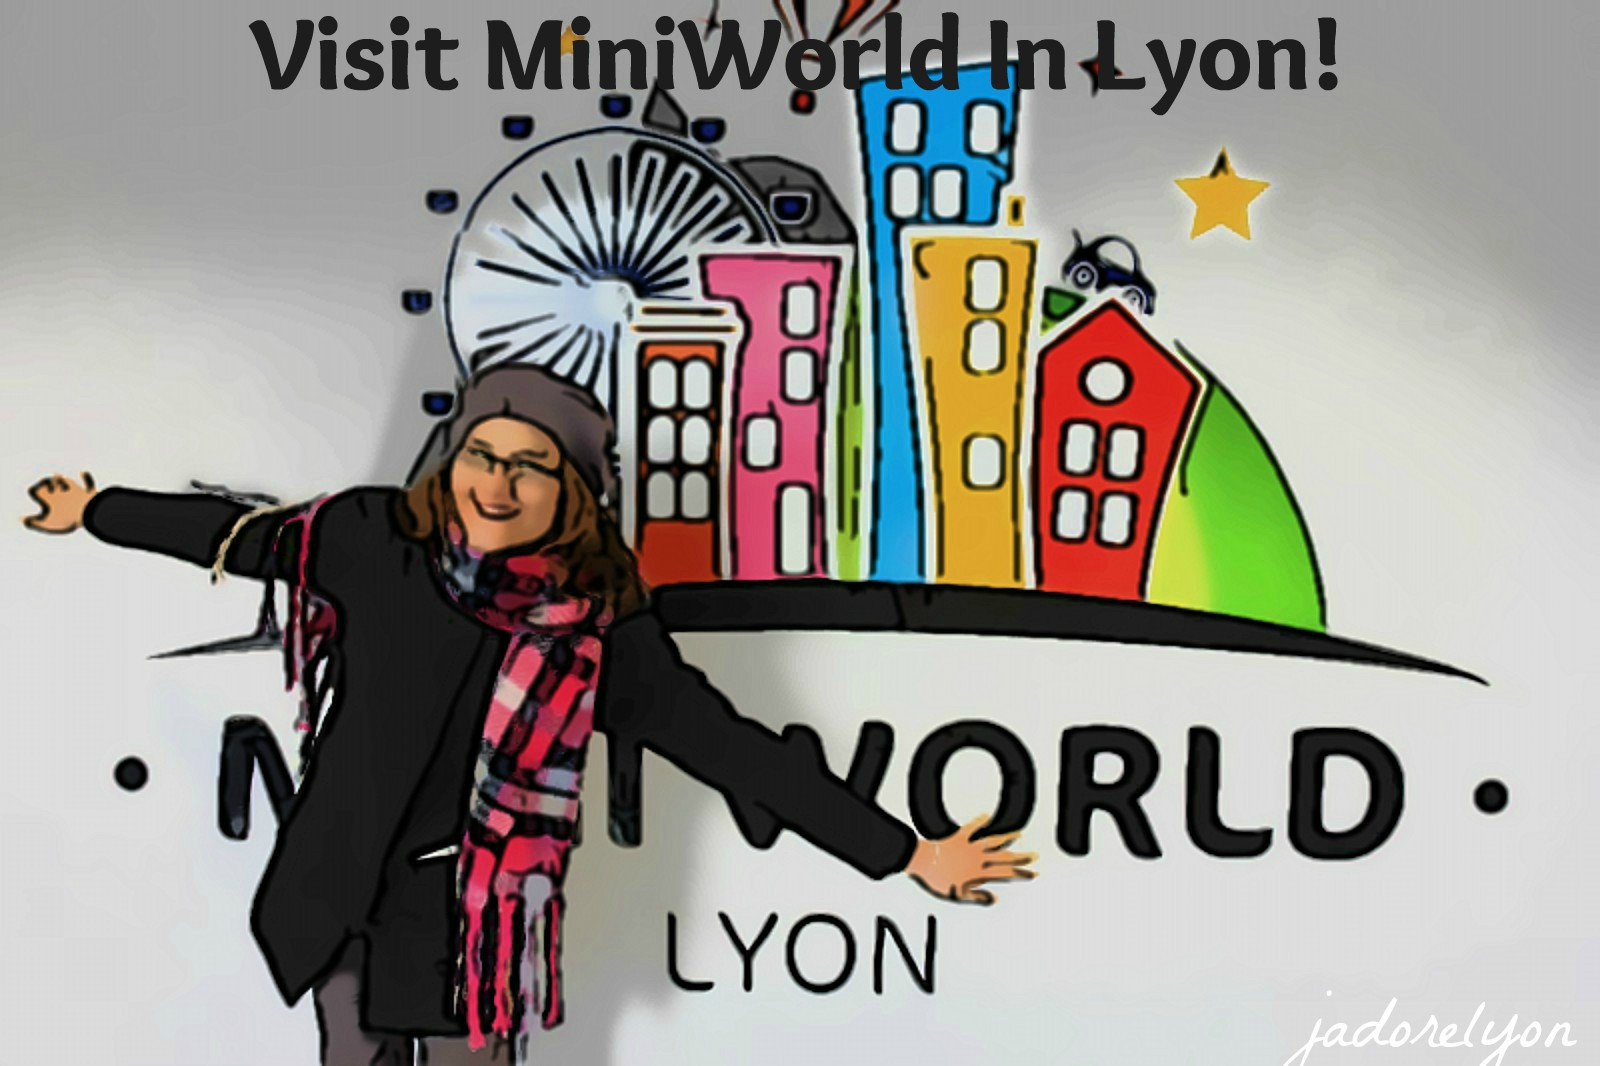 Visit MiniWorld